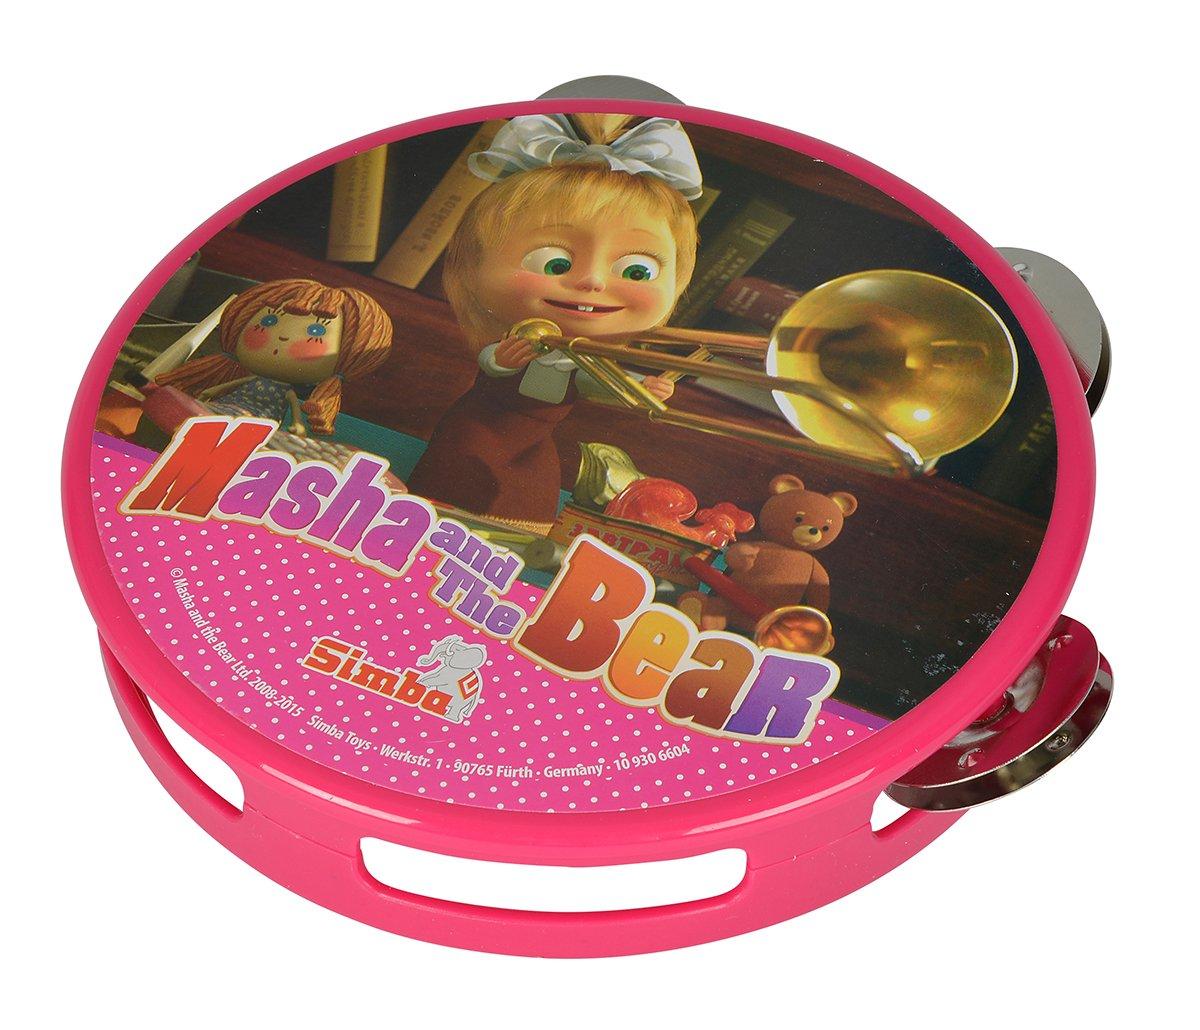 Simba 109306604 Mascha und der B/är Tamburin pink